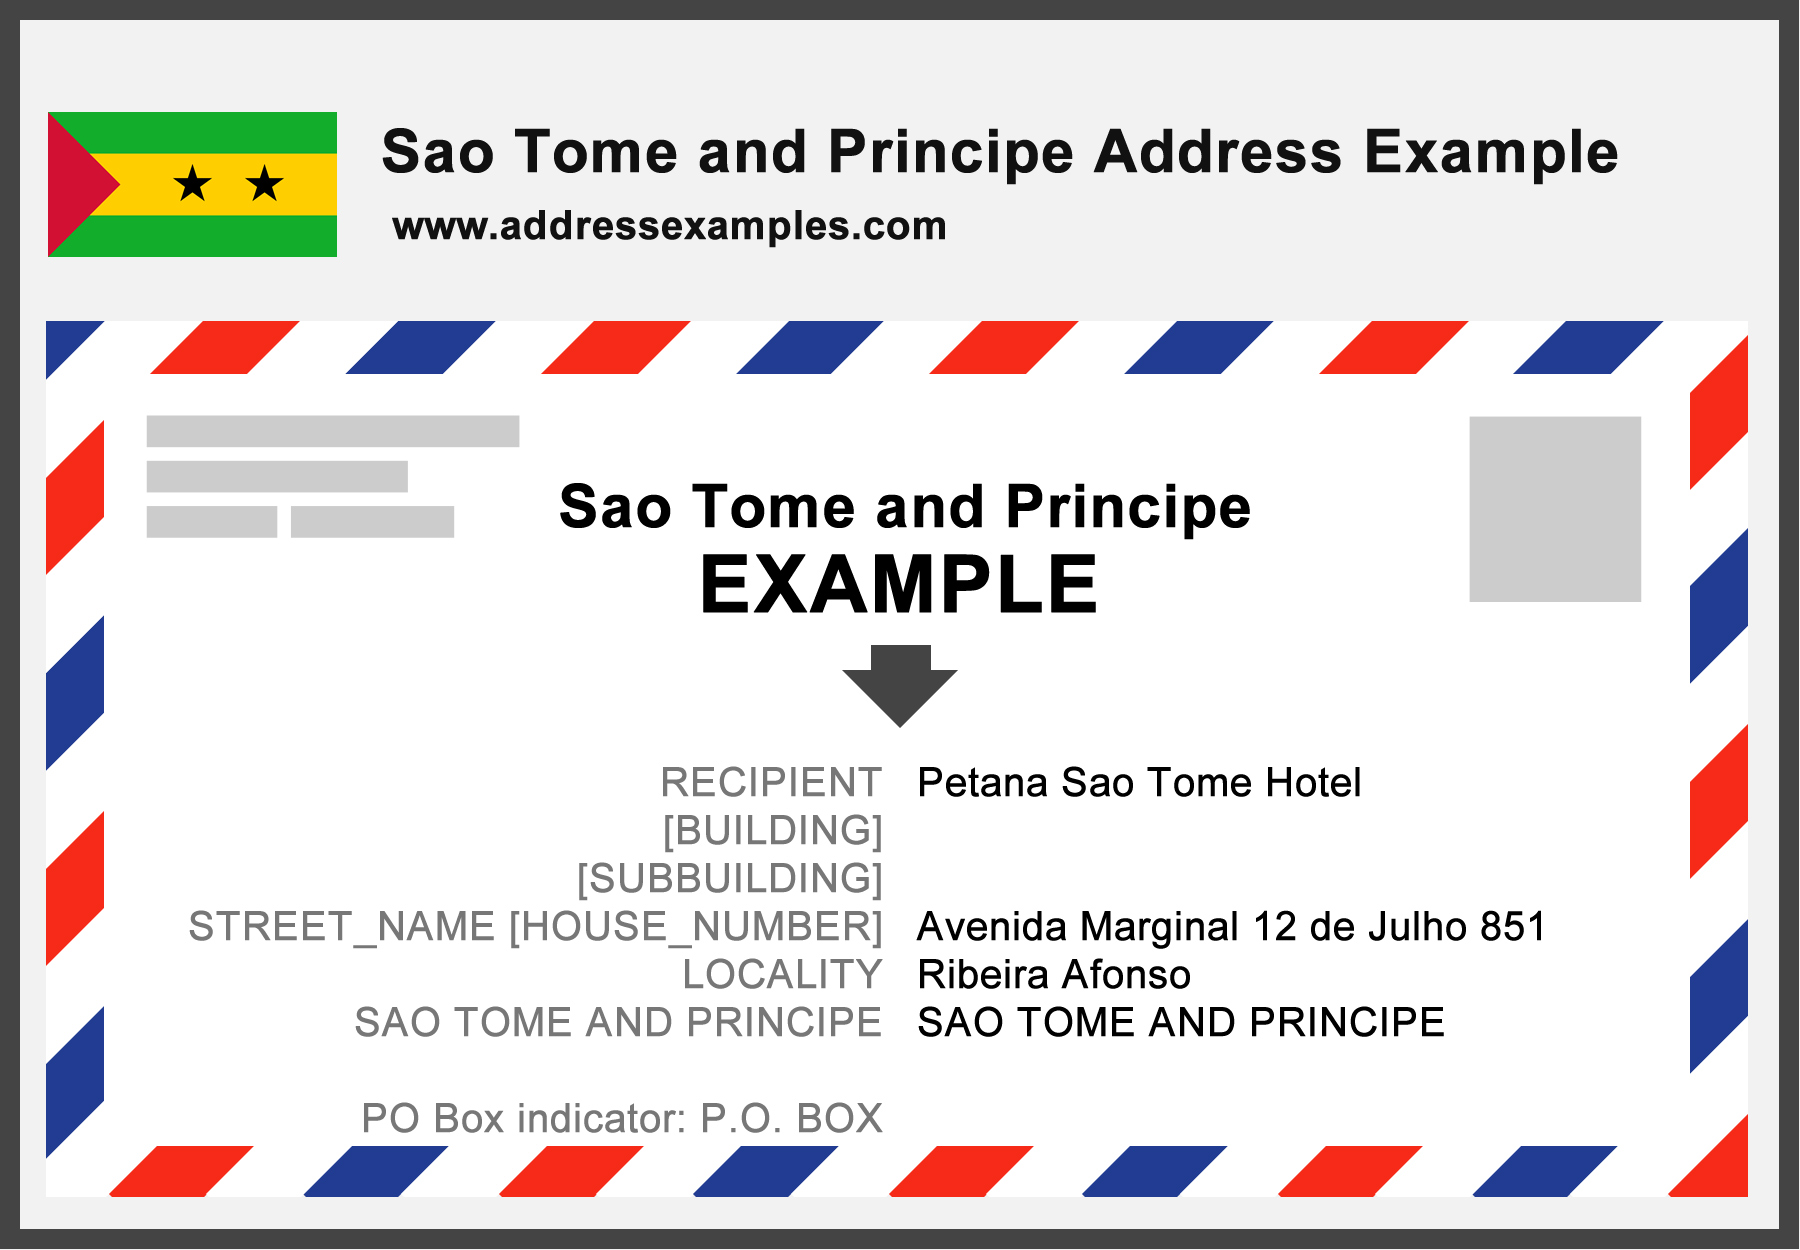 Sao Tome Principe Address Example